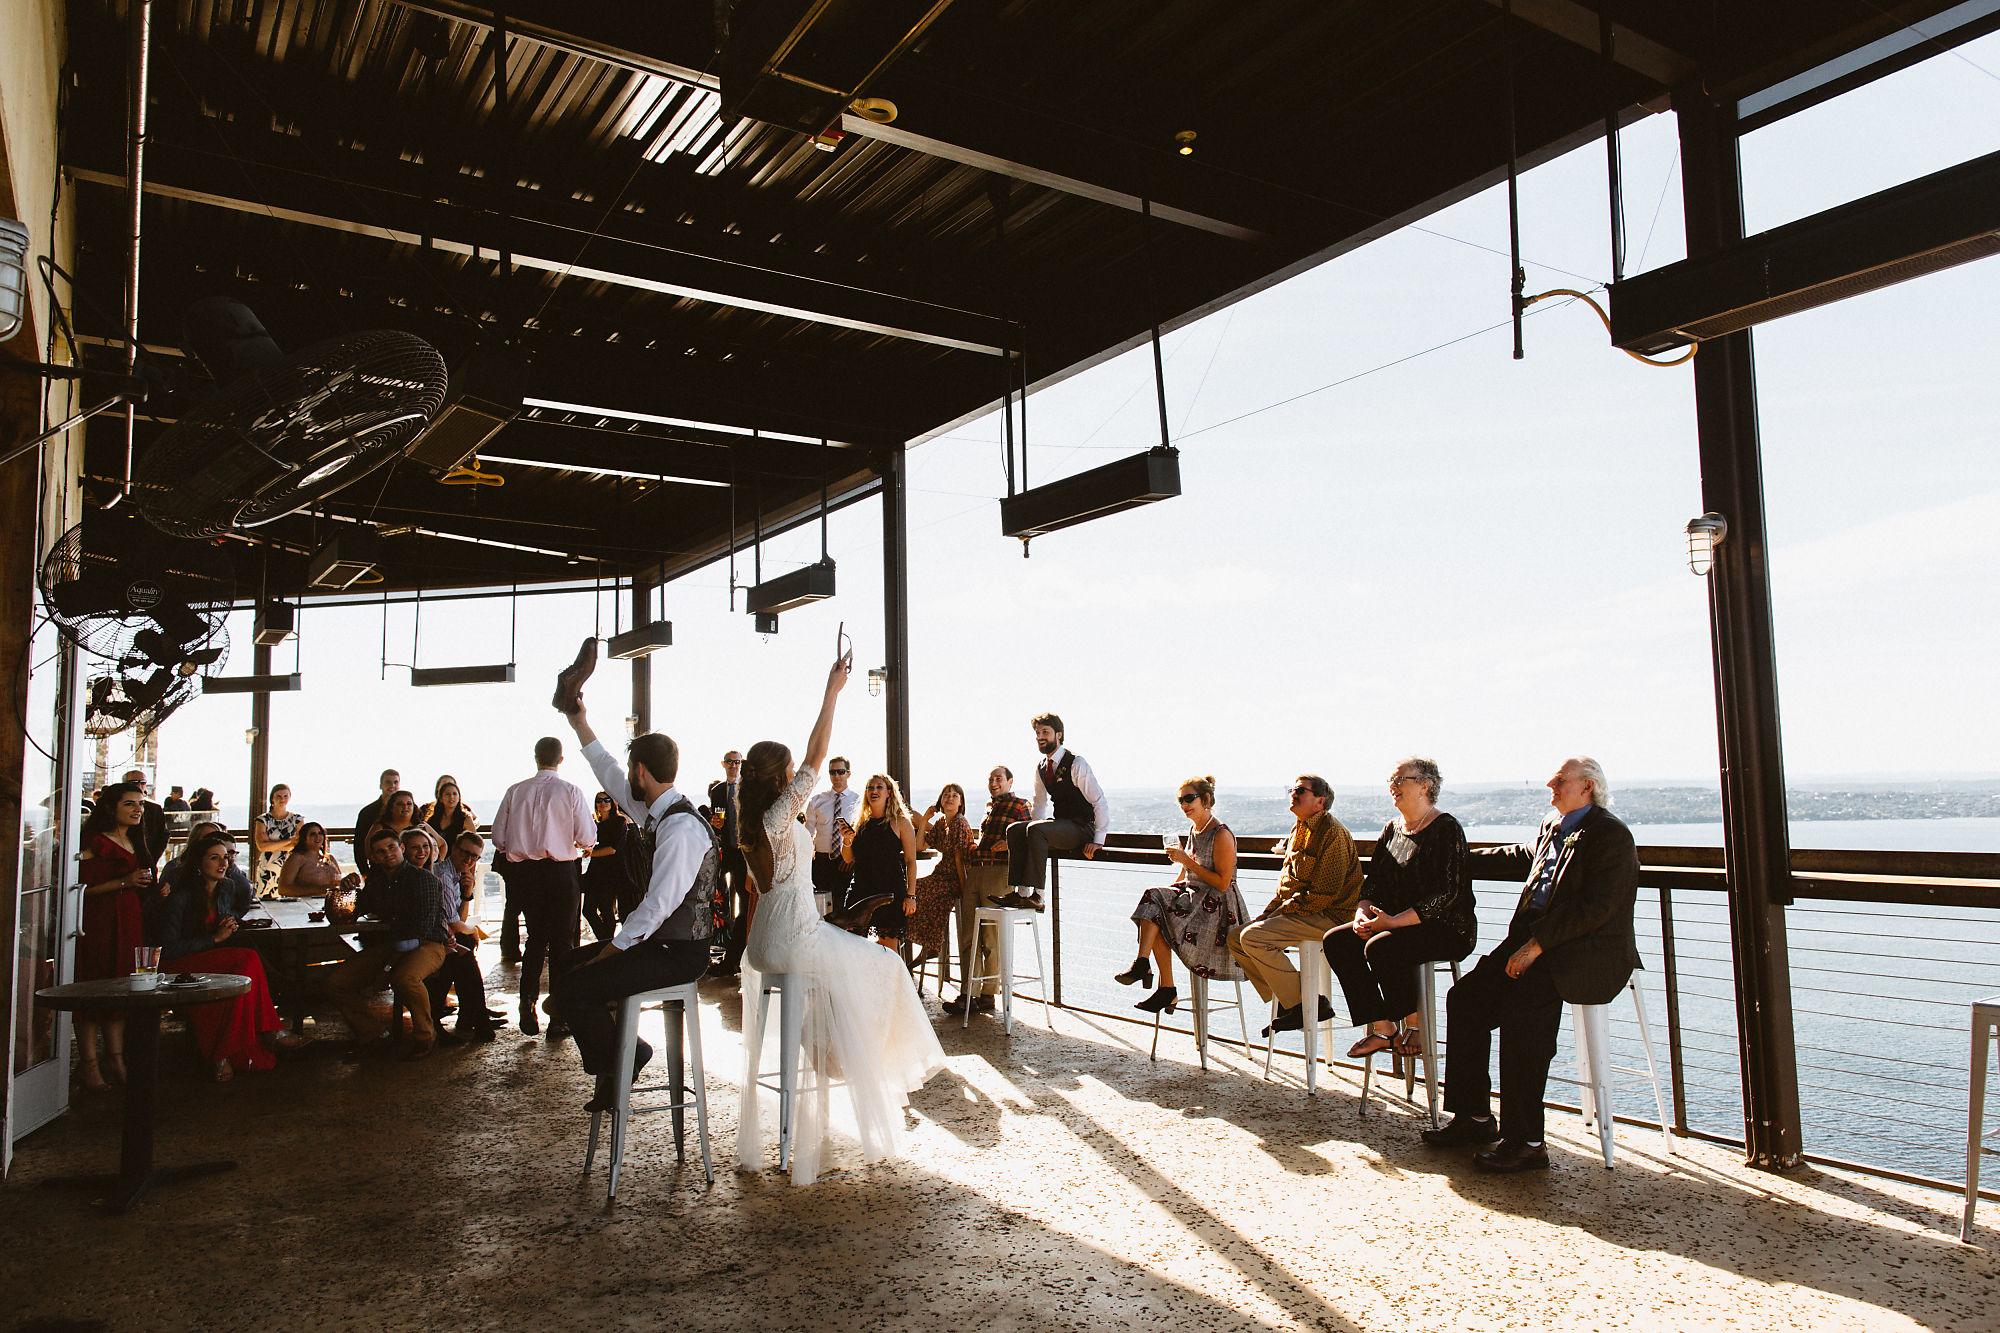 jessica_austin_oasis_brewery_wedding_photos161208.jpg